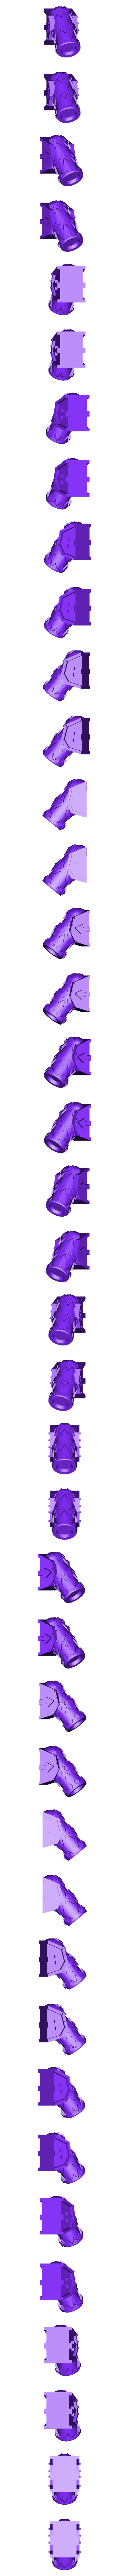 LordGonamCommandShipDeckGuns.stl Download free STL file GONAM Lord GONAM Command Ship proxy • 3D printer design, barnEbiss2